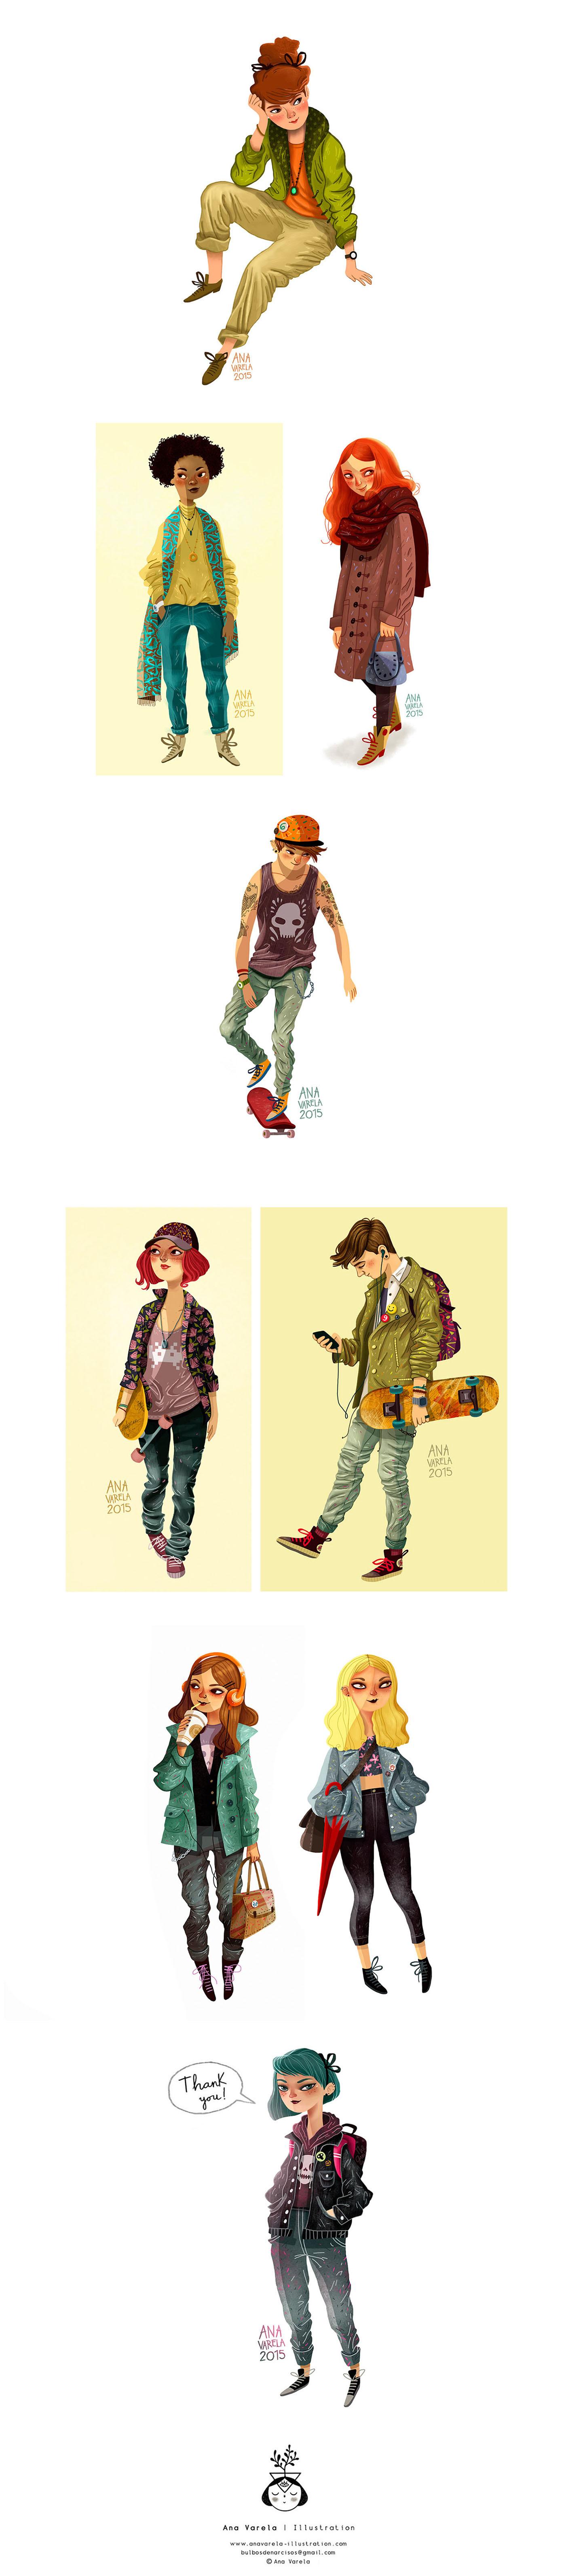 ana varela Figure Drawing digital sketches art Fashion Sketches